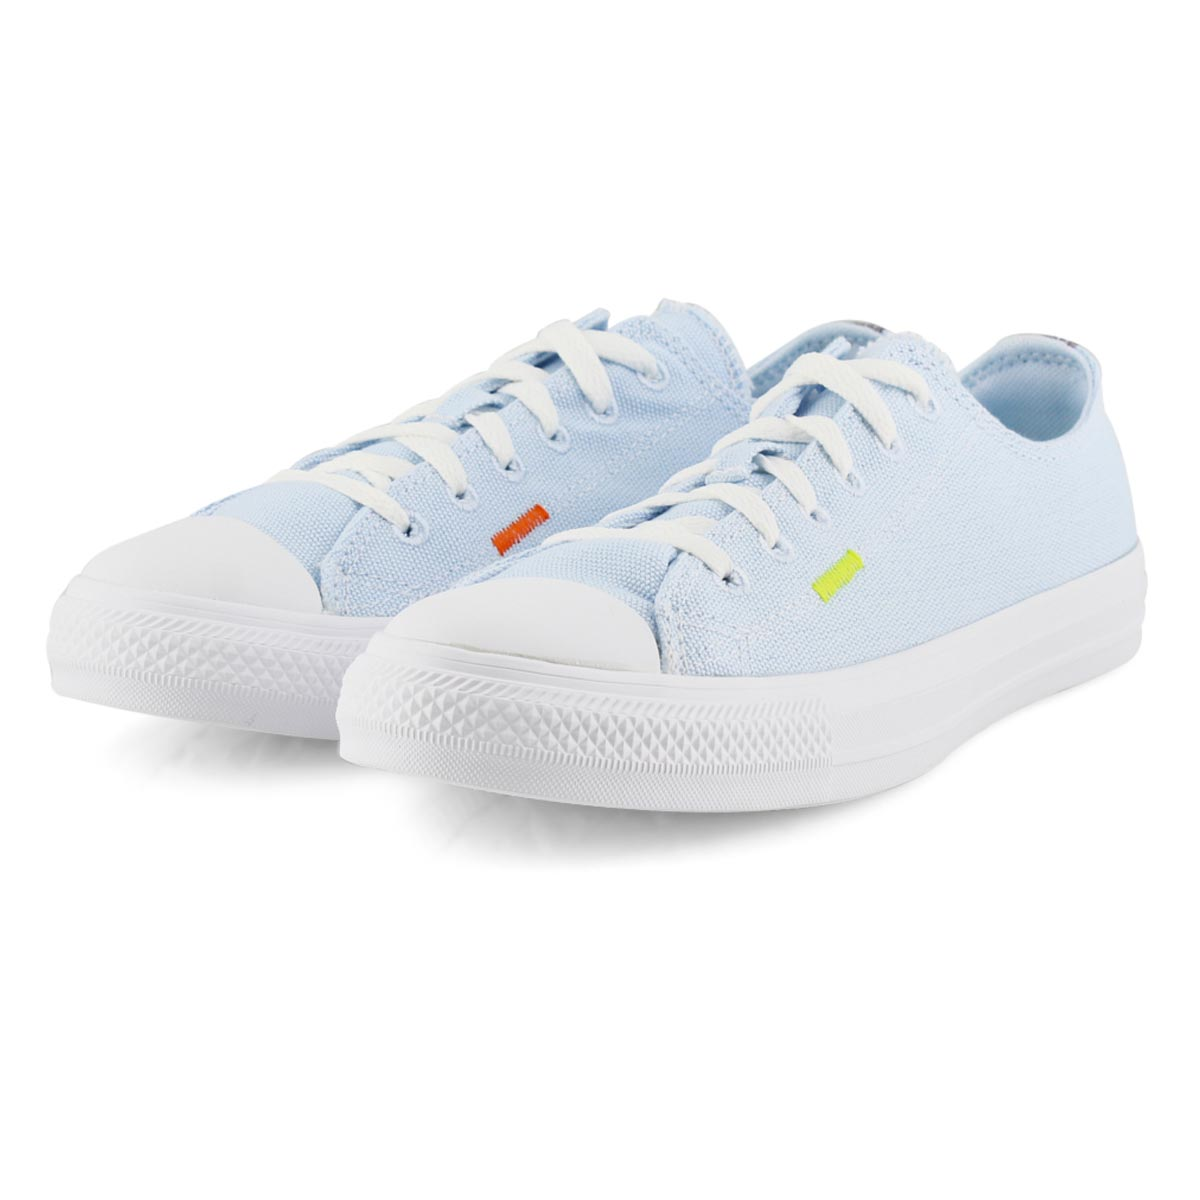 Women's All Star Seasonal Sneaker - Blue/Lemon